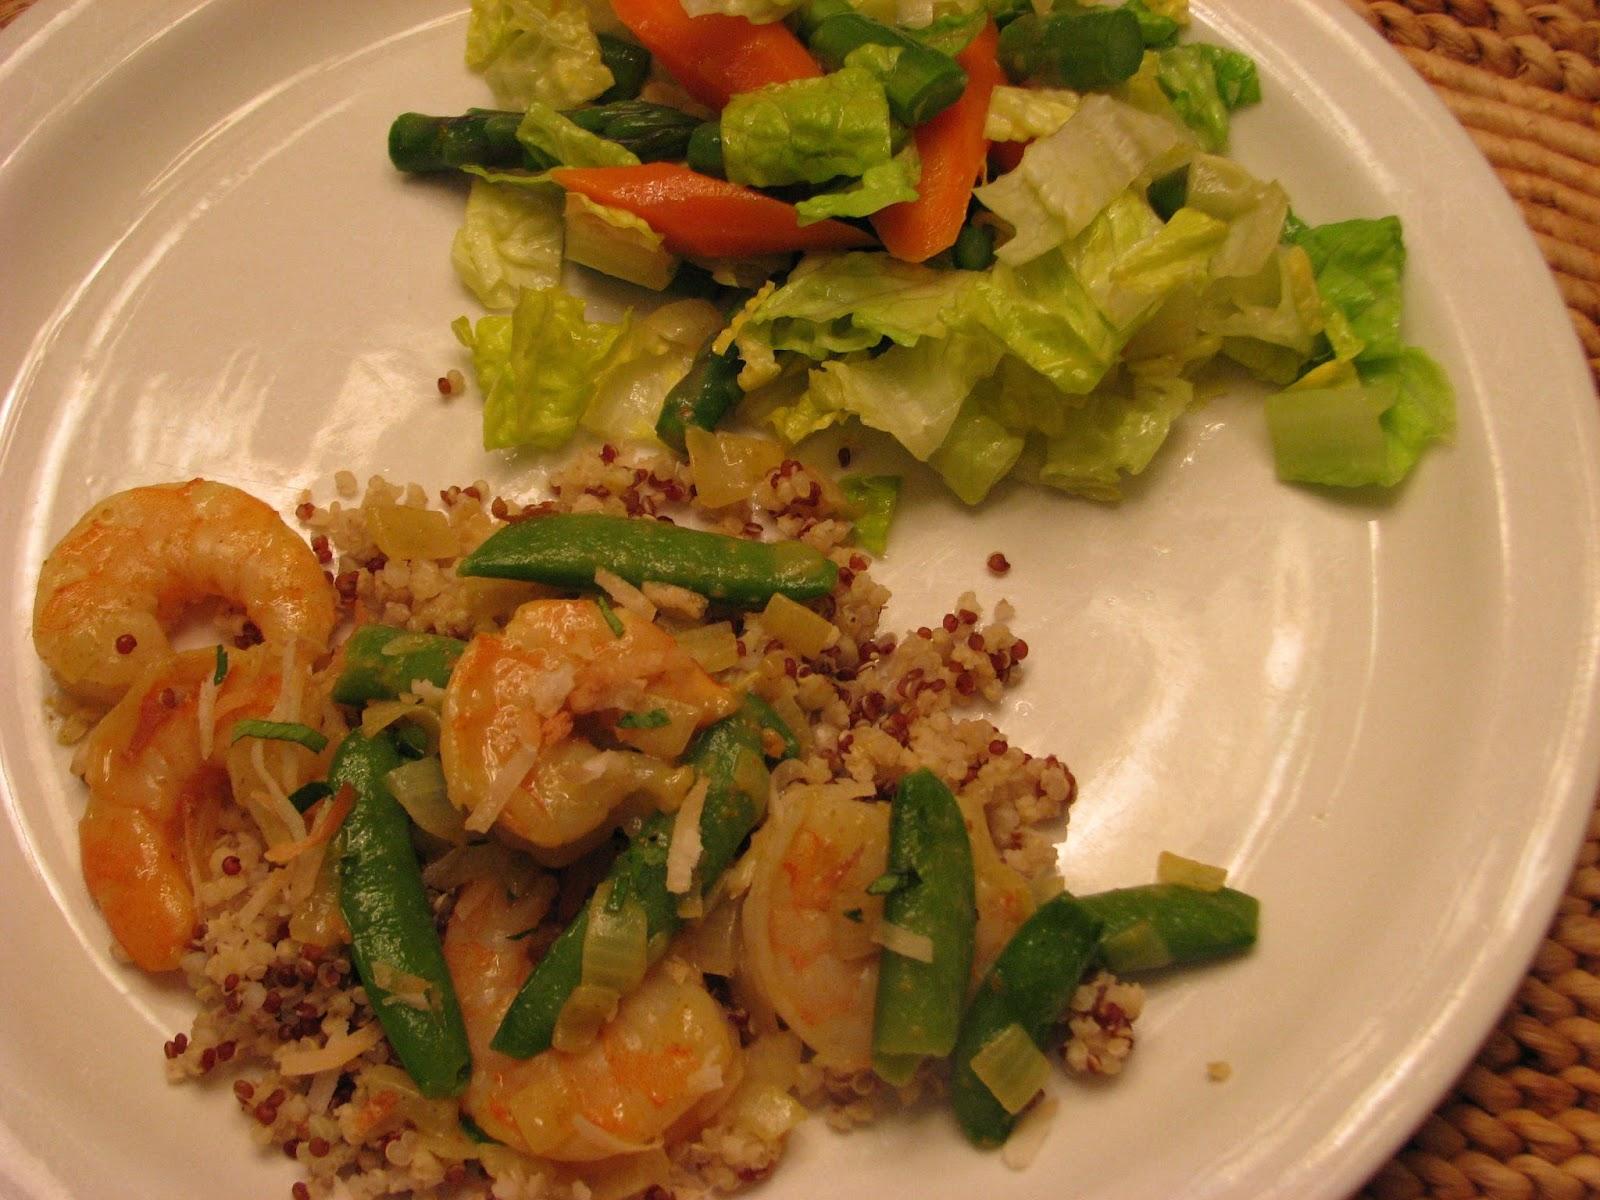 TheFultonGirls: (Spicy) Coconut Shrimp with Quinoa